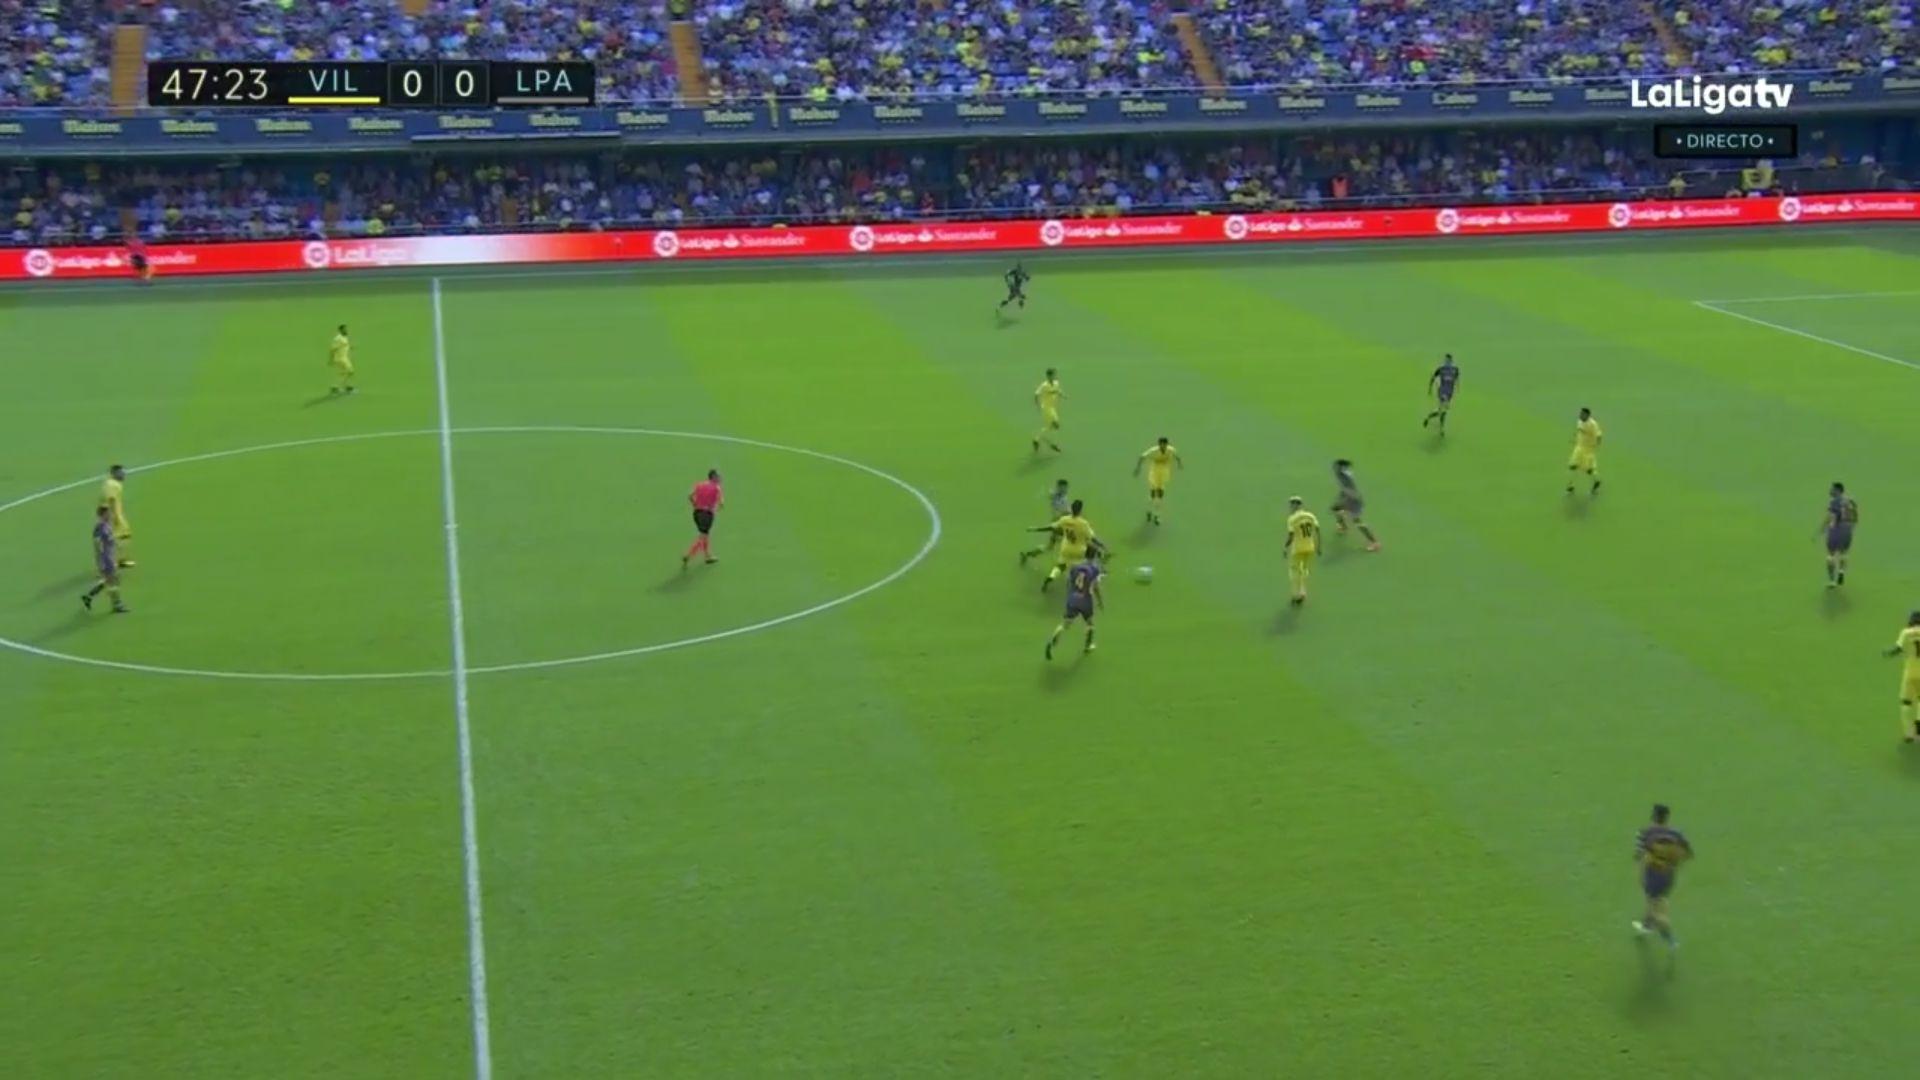 22-10-2017 - Villarreal 4-0 Las Palmas